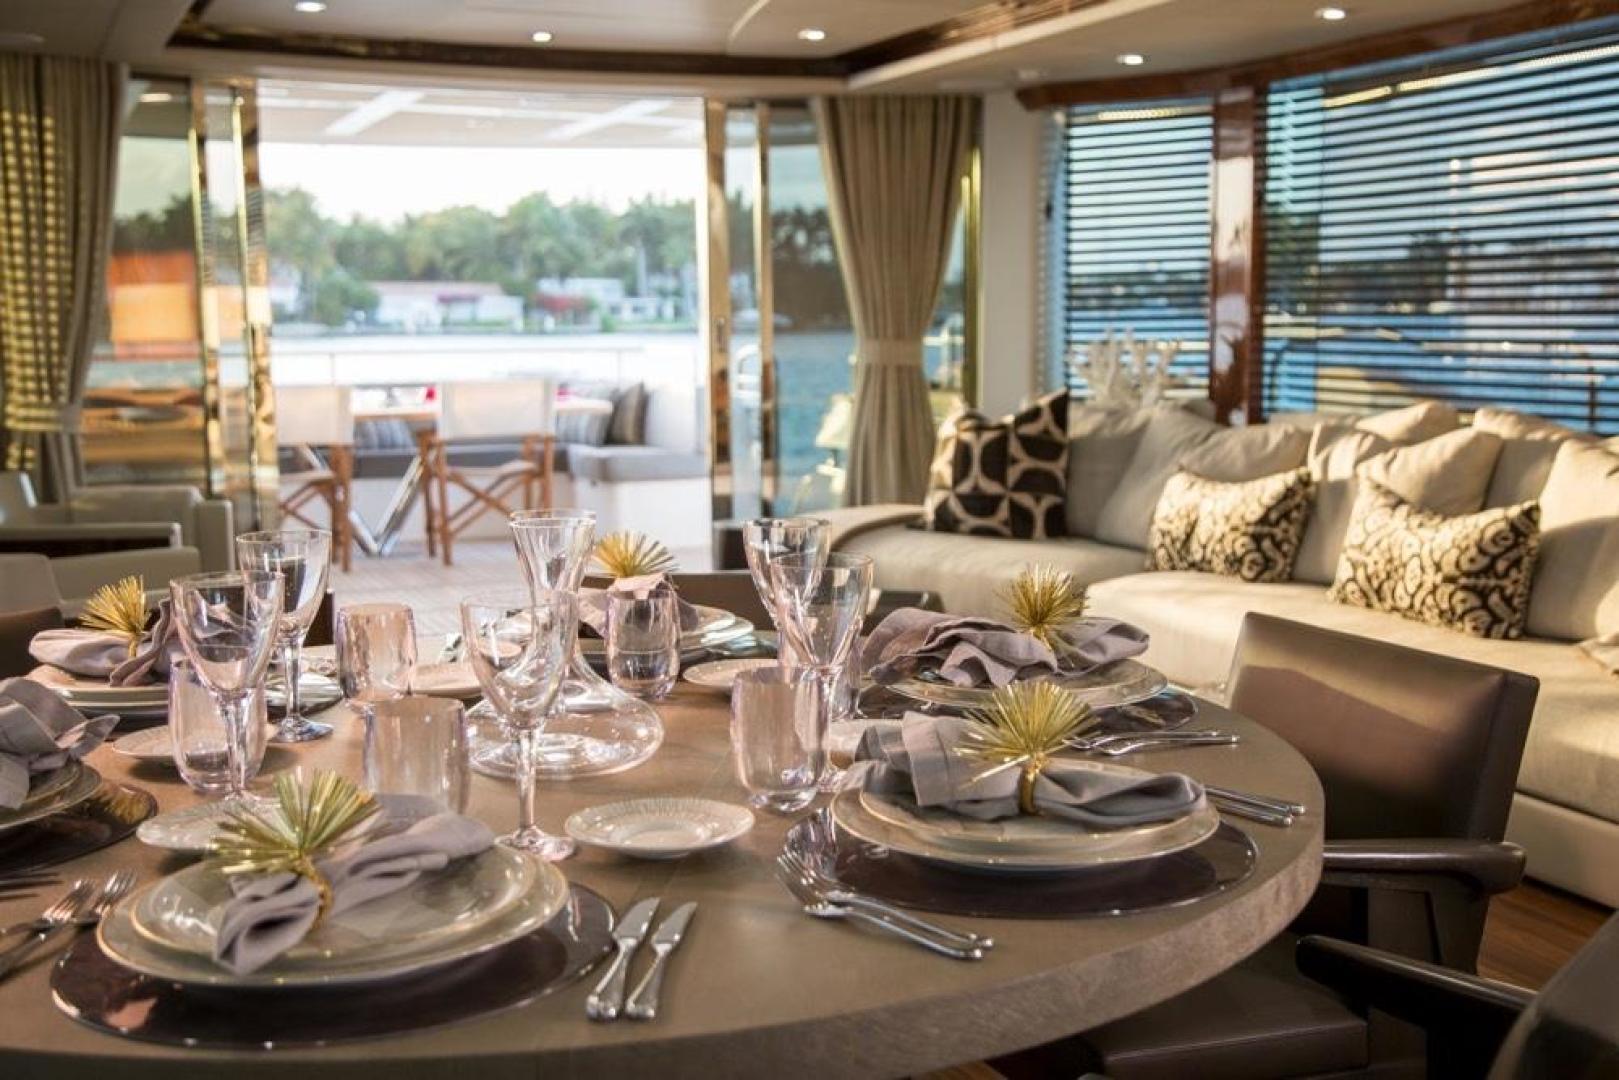 Sunseeker-28 Metre Yacht 2016-RIII Miami-Florida-United States-2016 SUNSEEKER 92 RIII FOR SALE-600097 | Thumbnail